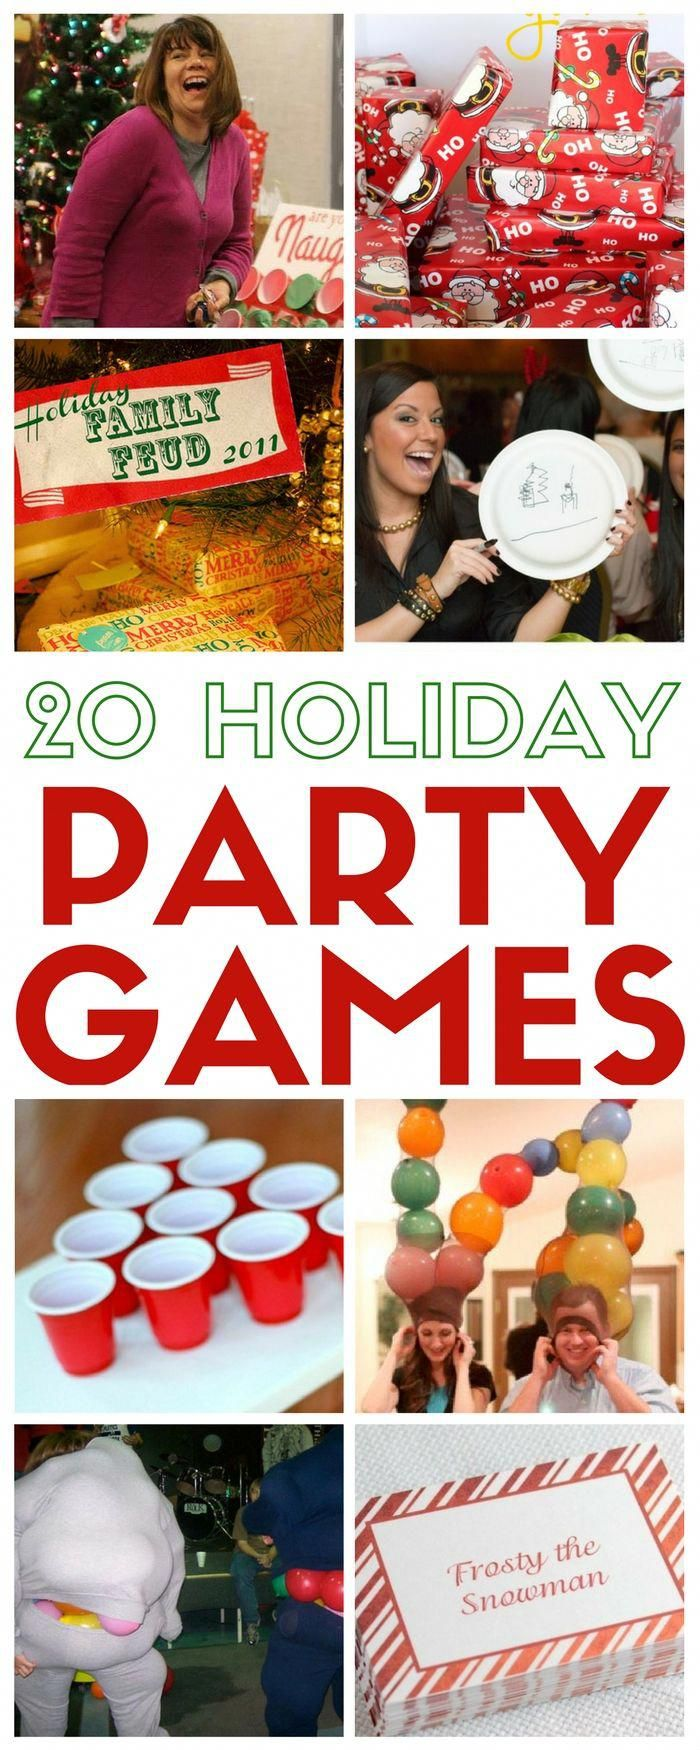 Fun Christmas Party Games Christmas Games Ideas For Everyone Christmas Charades Game Fun Christmas Party Games Christmas Charades